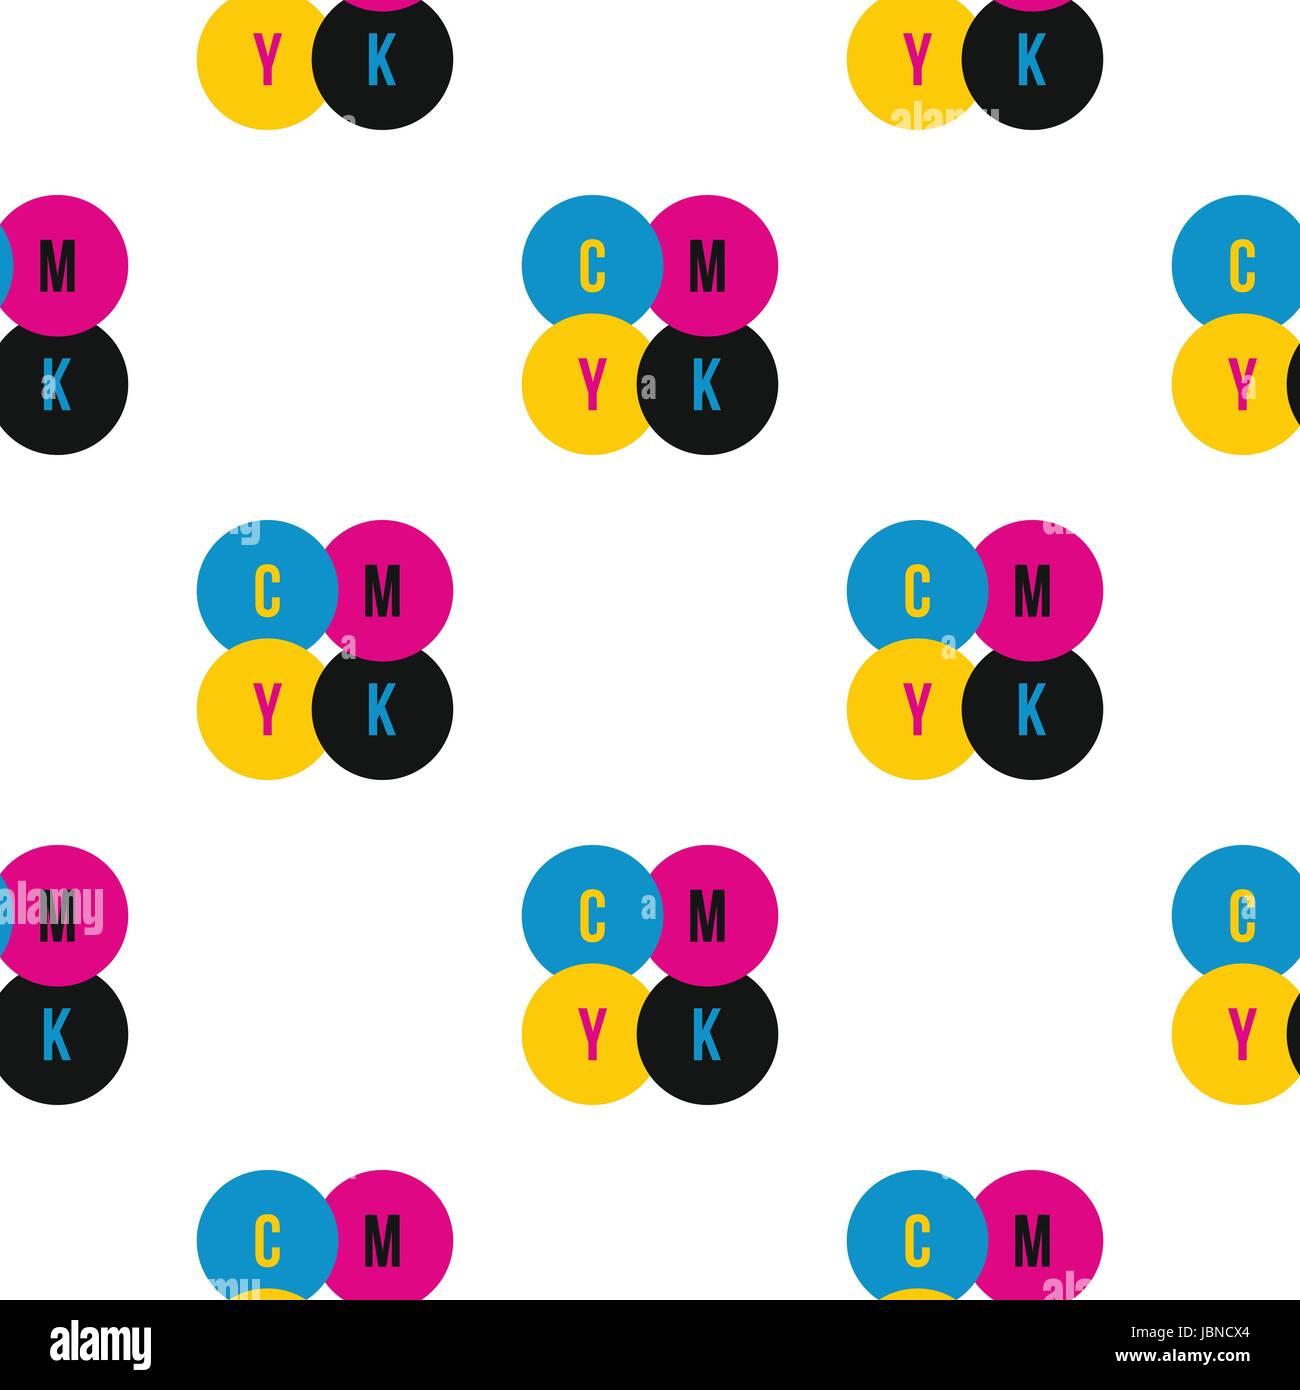 Unduh 57 Background X Repeat Paling Keren